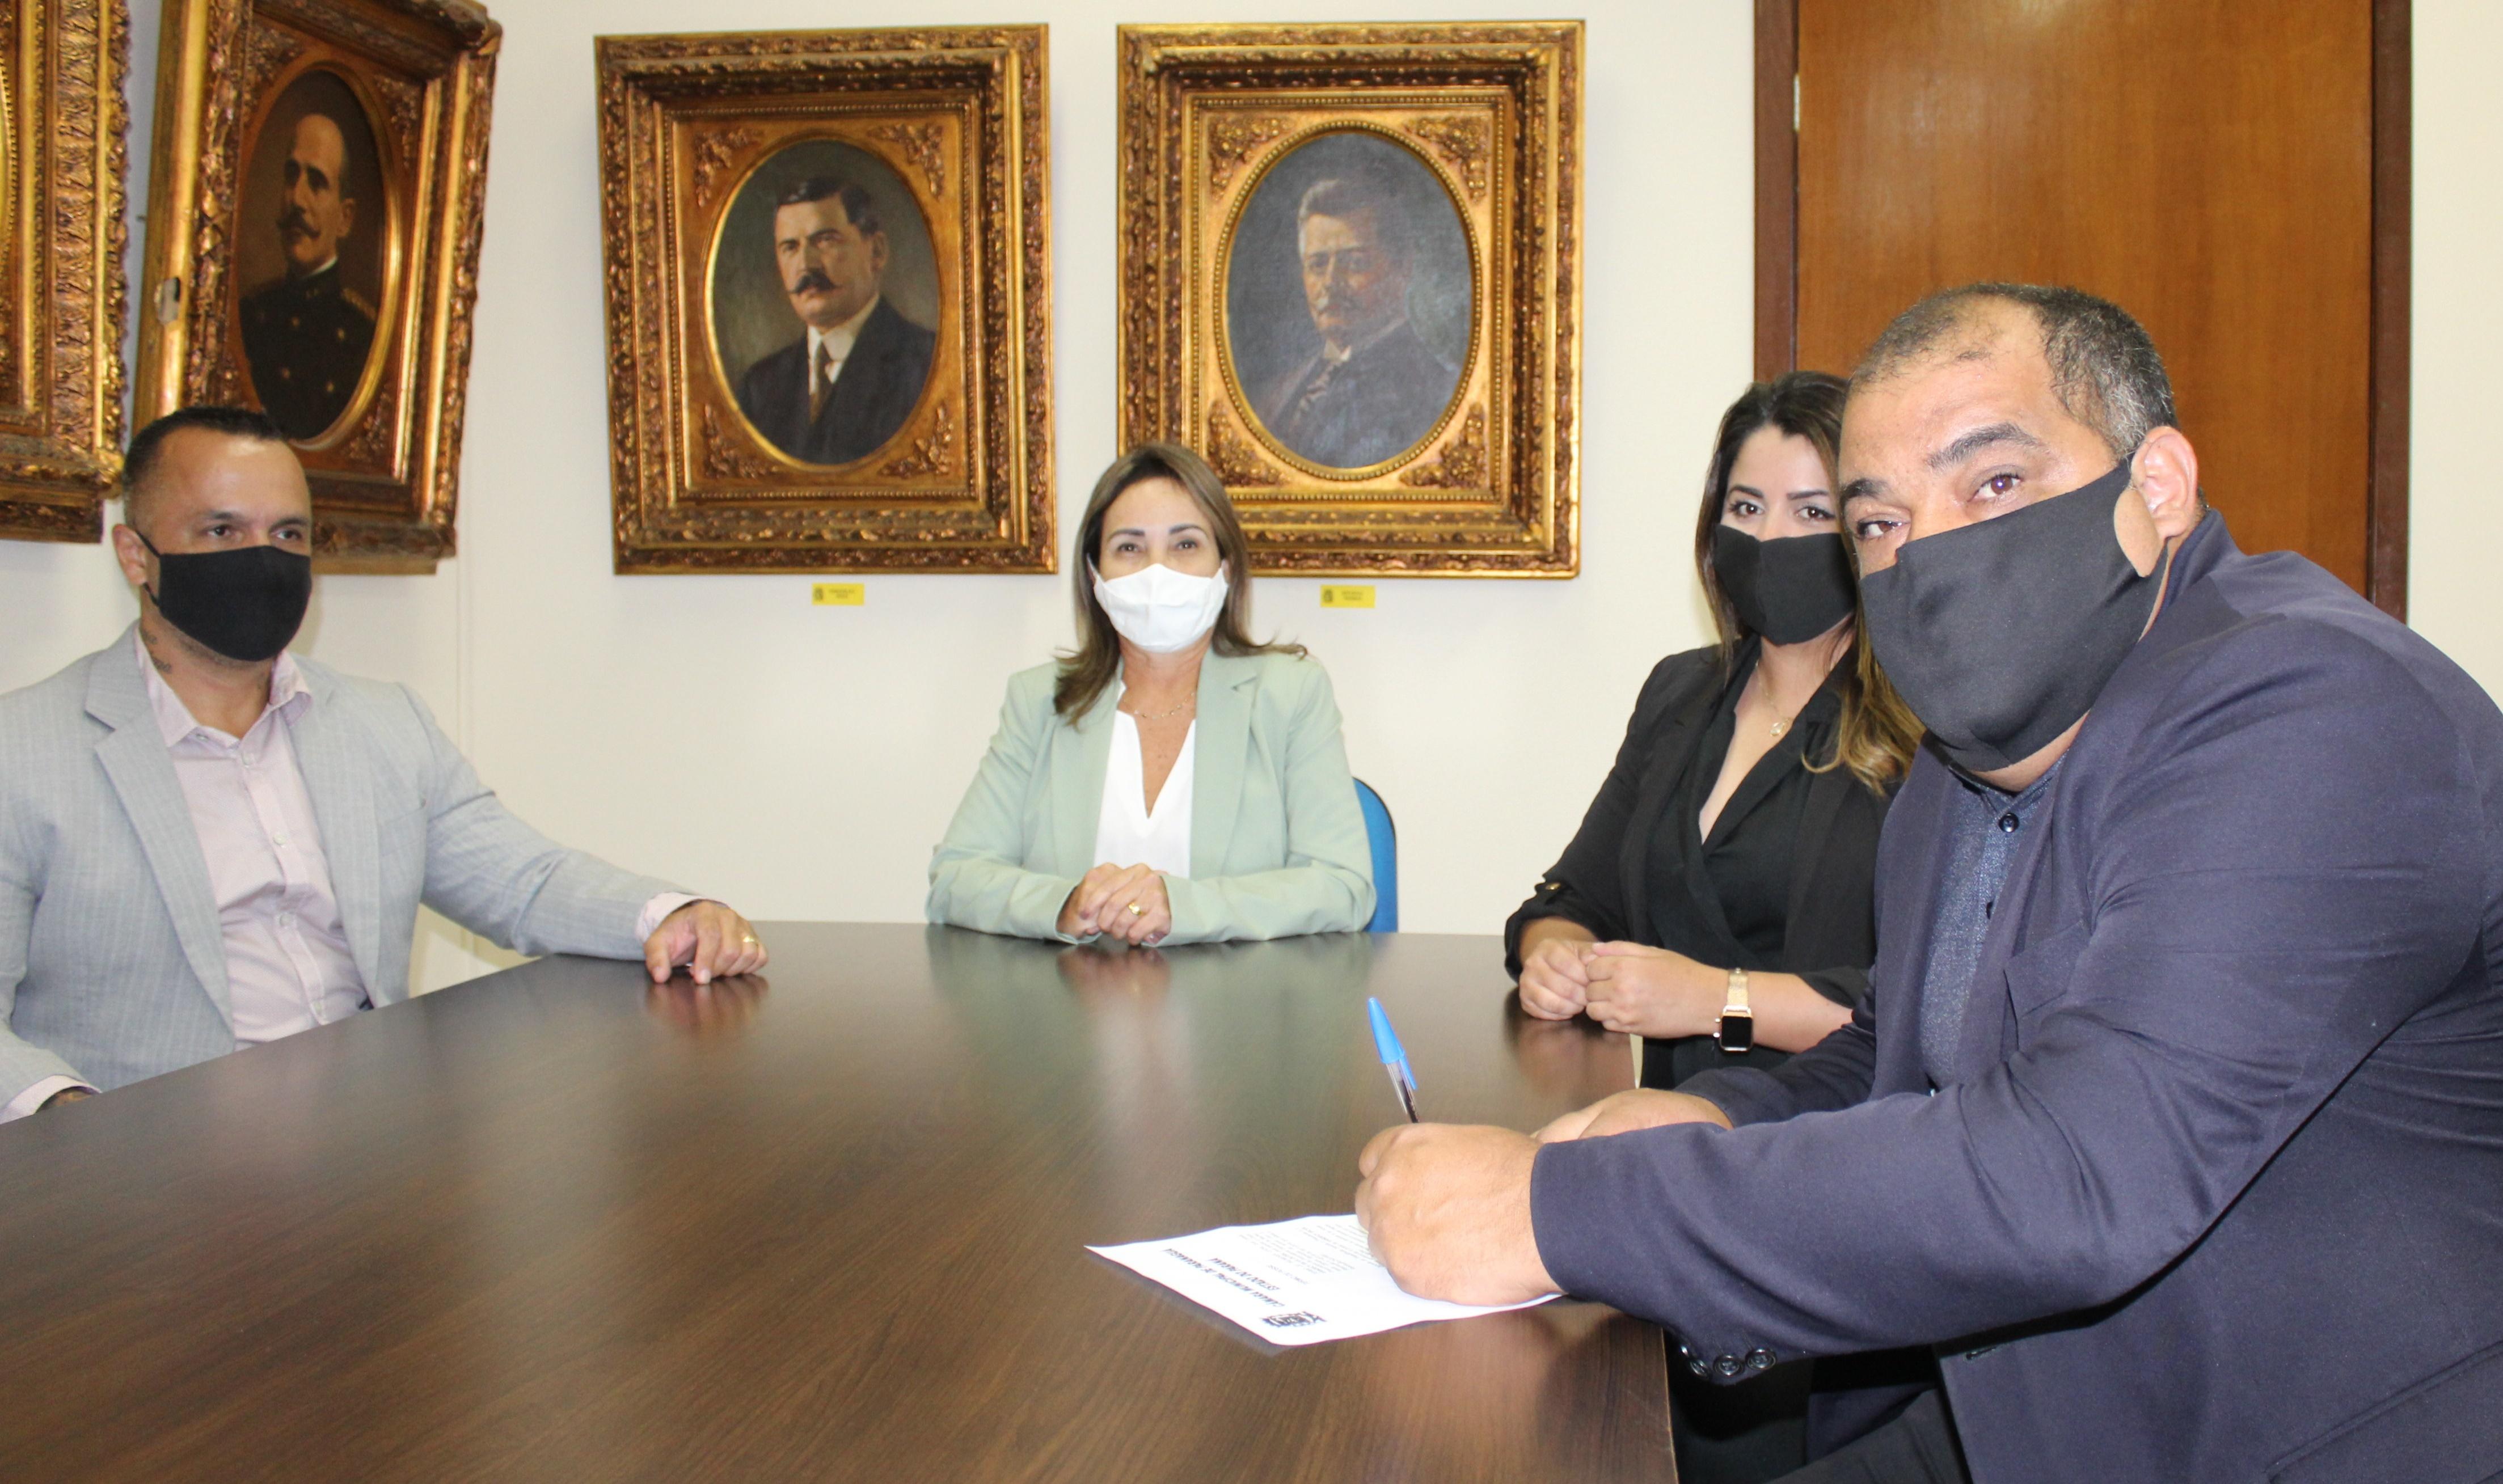 O presidente da Câmara de Vereadores, Fábio Santos, falou da importância do ato.